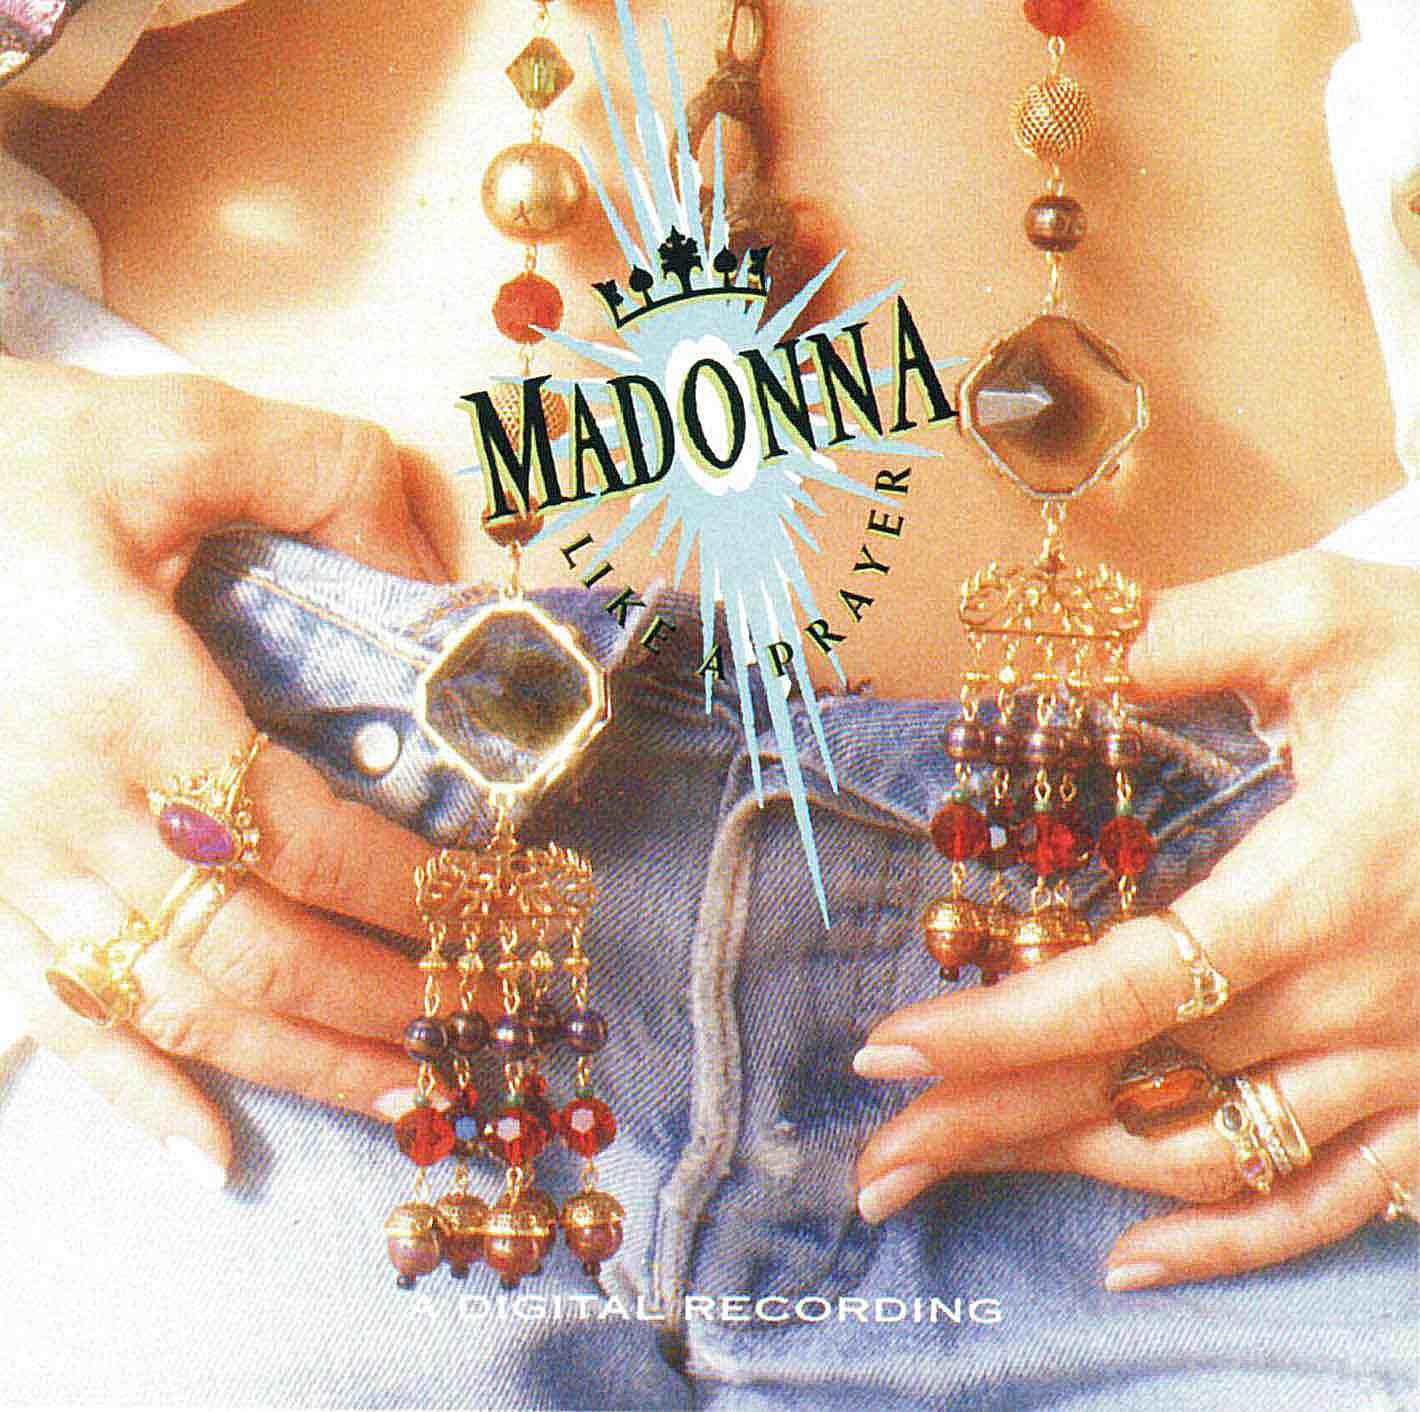 1989's 'Like a Prayer' LP cover